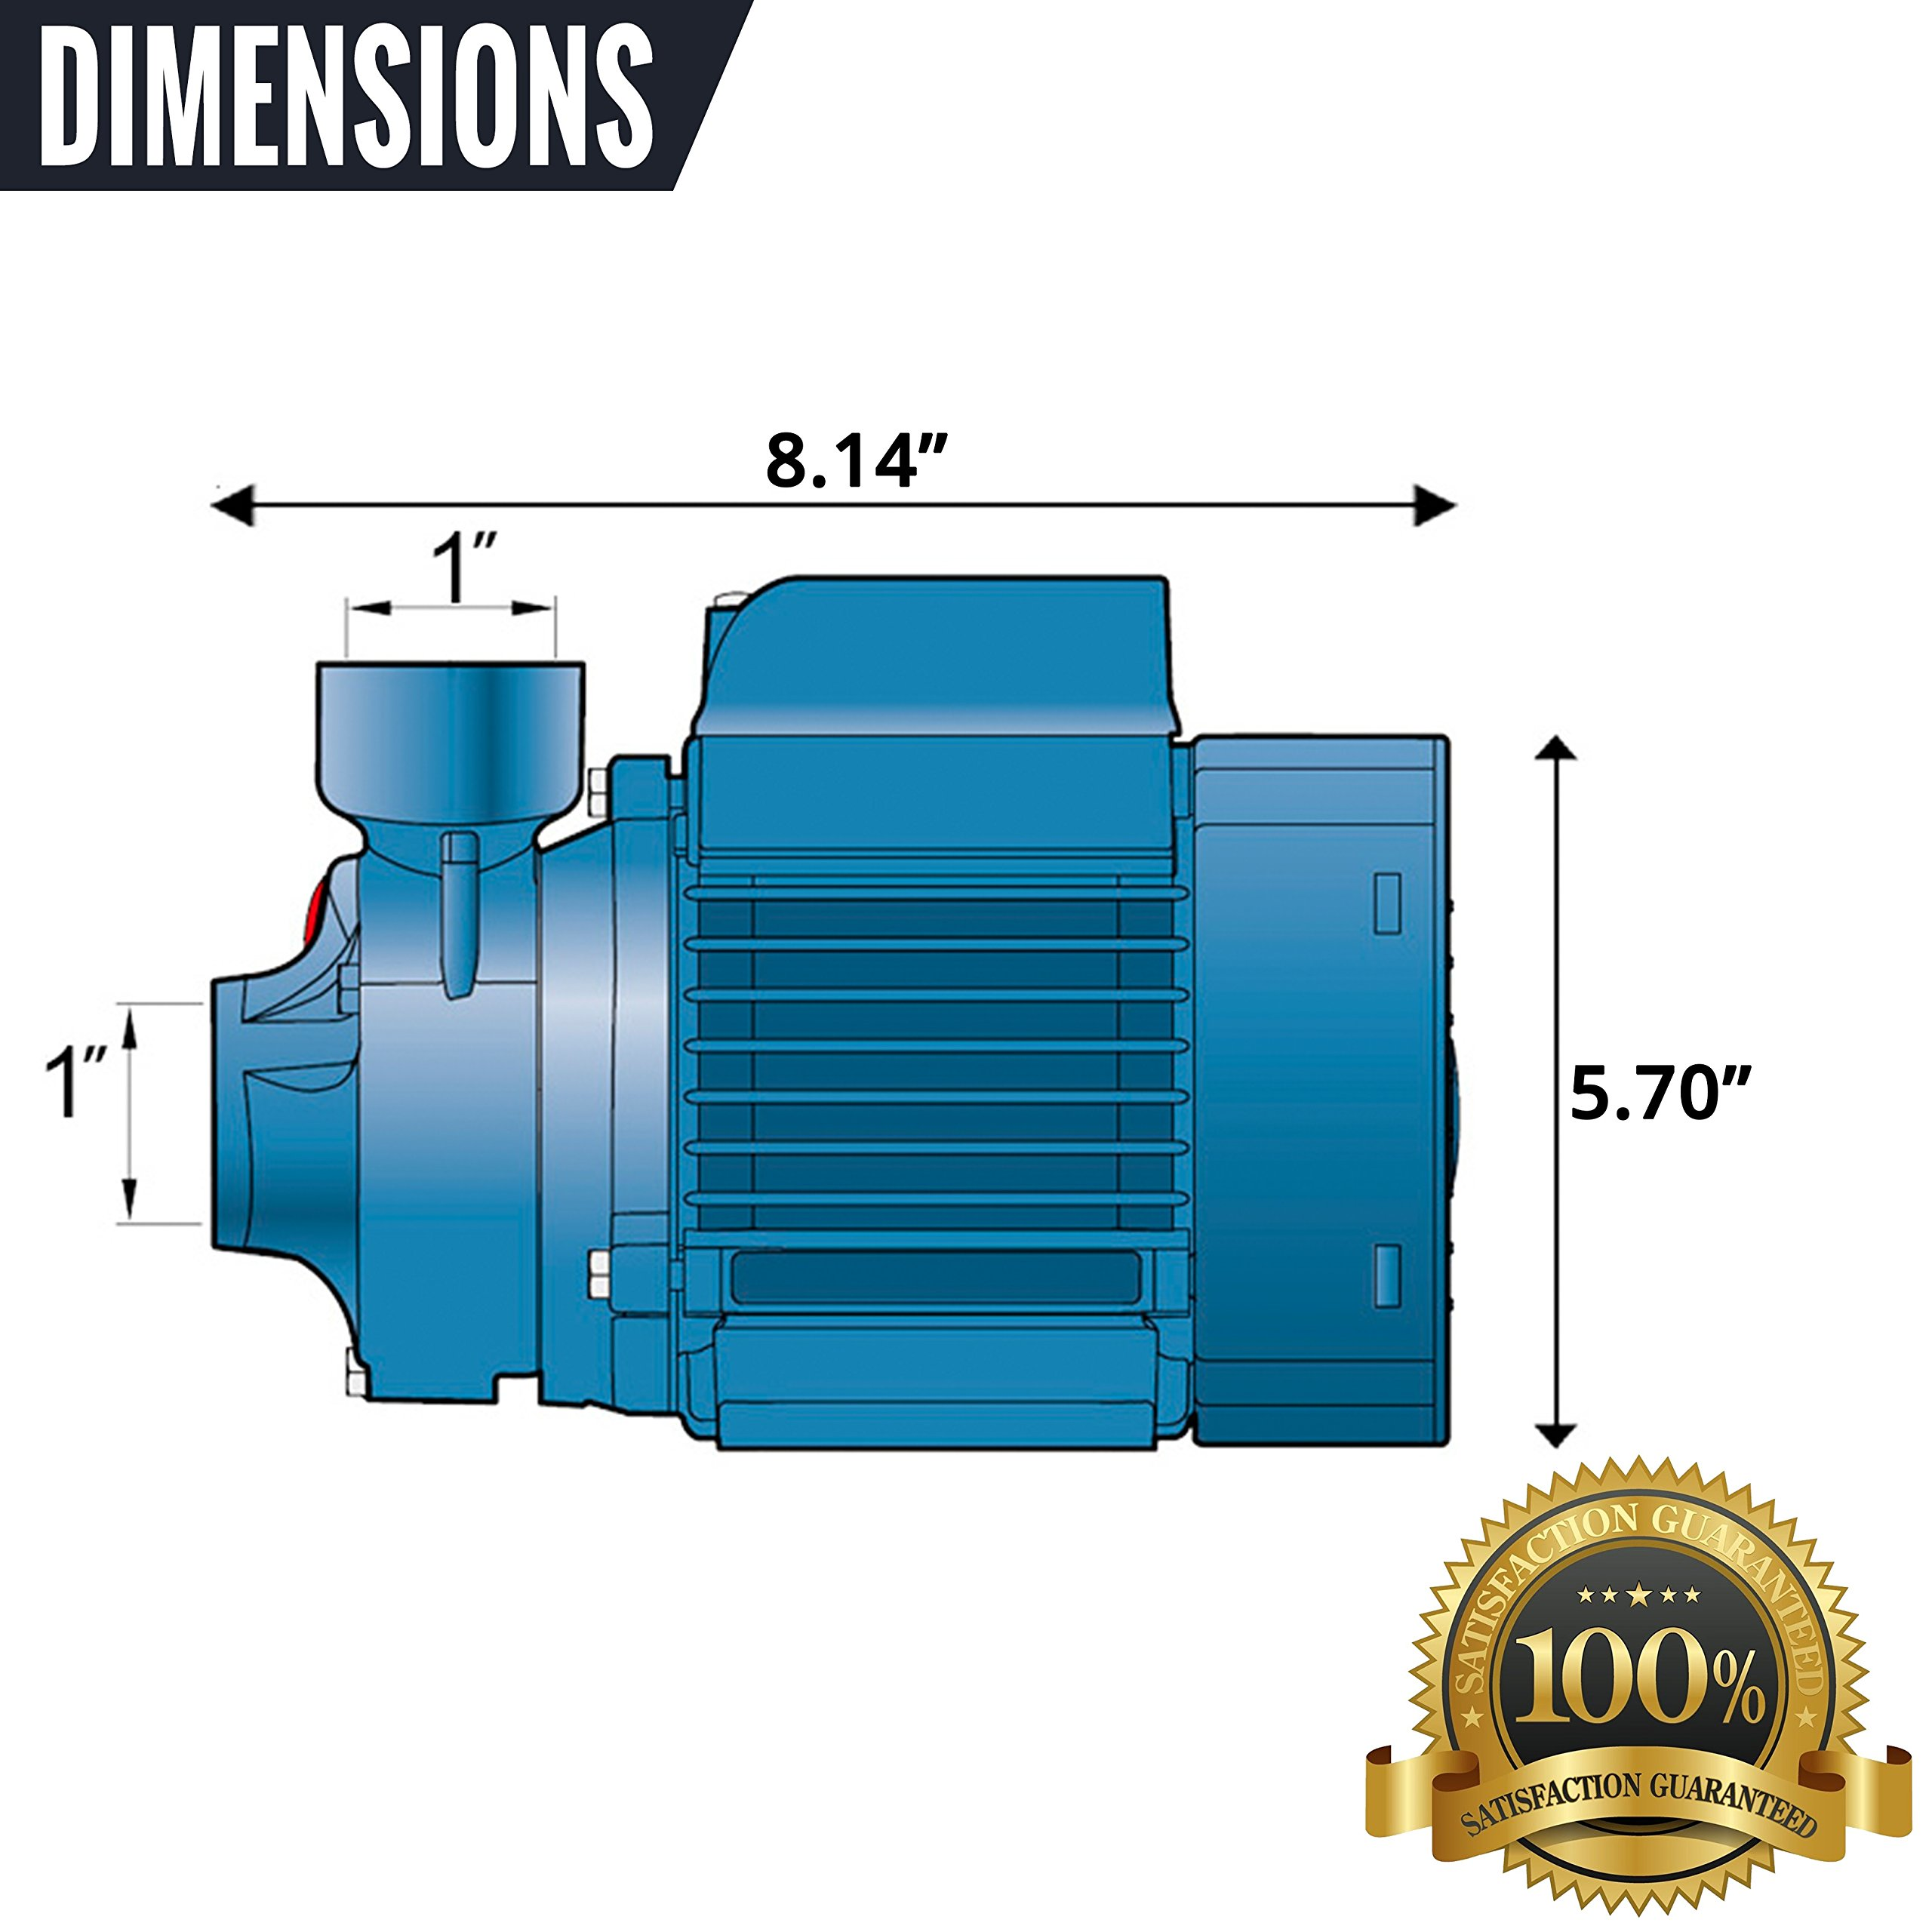 Pedrollo Booster Water Pump — 634 GPH, 1/2 HP, 115 Volts, Model# PKm60 by Pedrollo (Image #1)